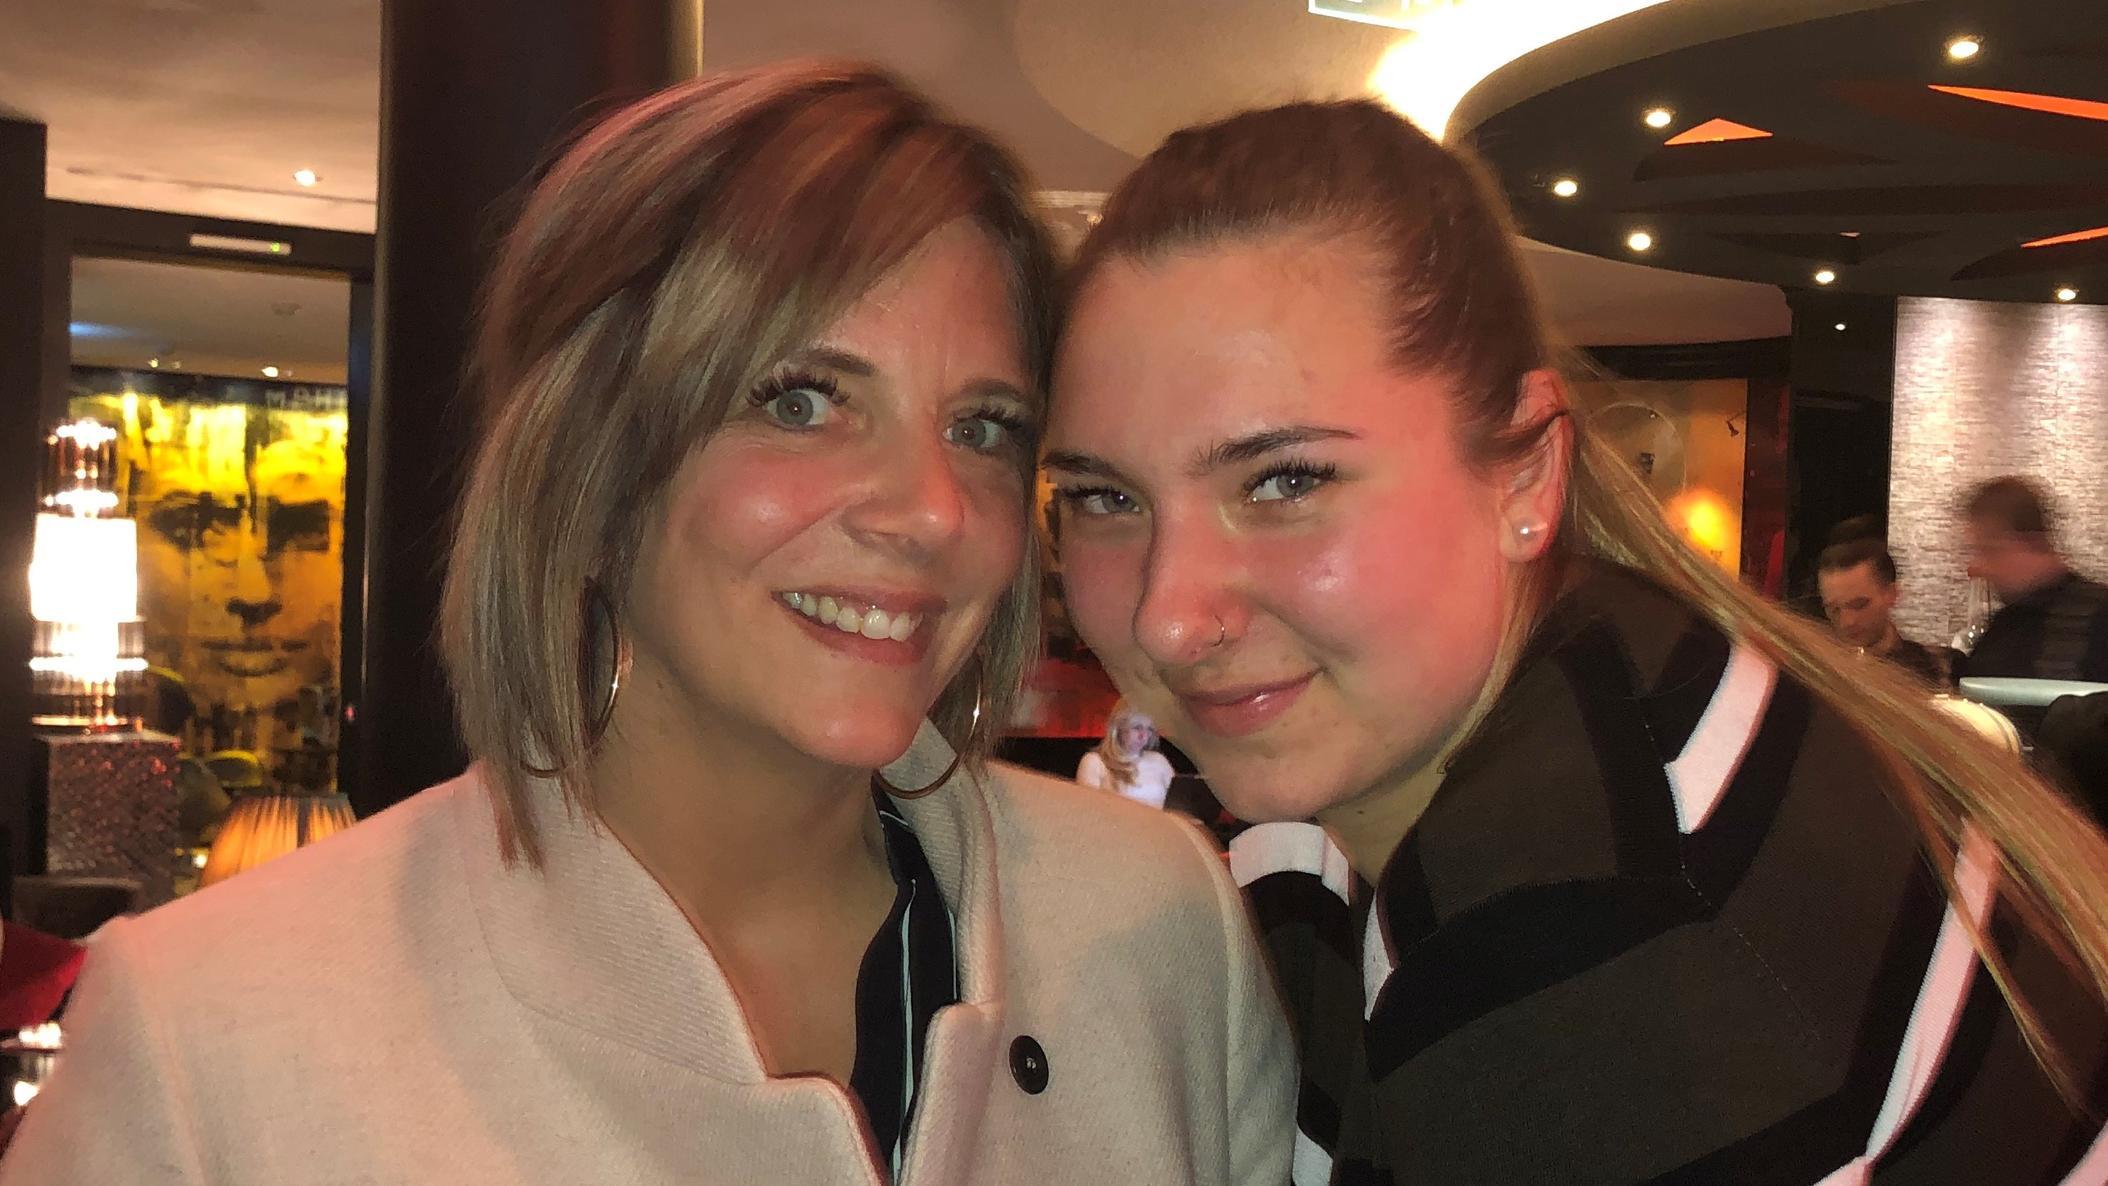 Danni Büchner: Tochter Joelina will ins Trash-TV - VIP.de, Star News